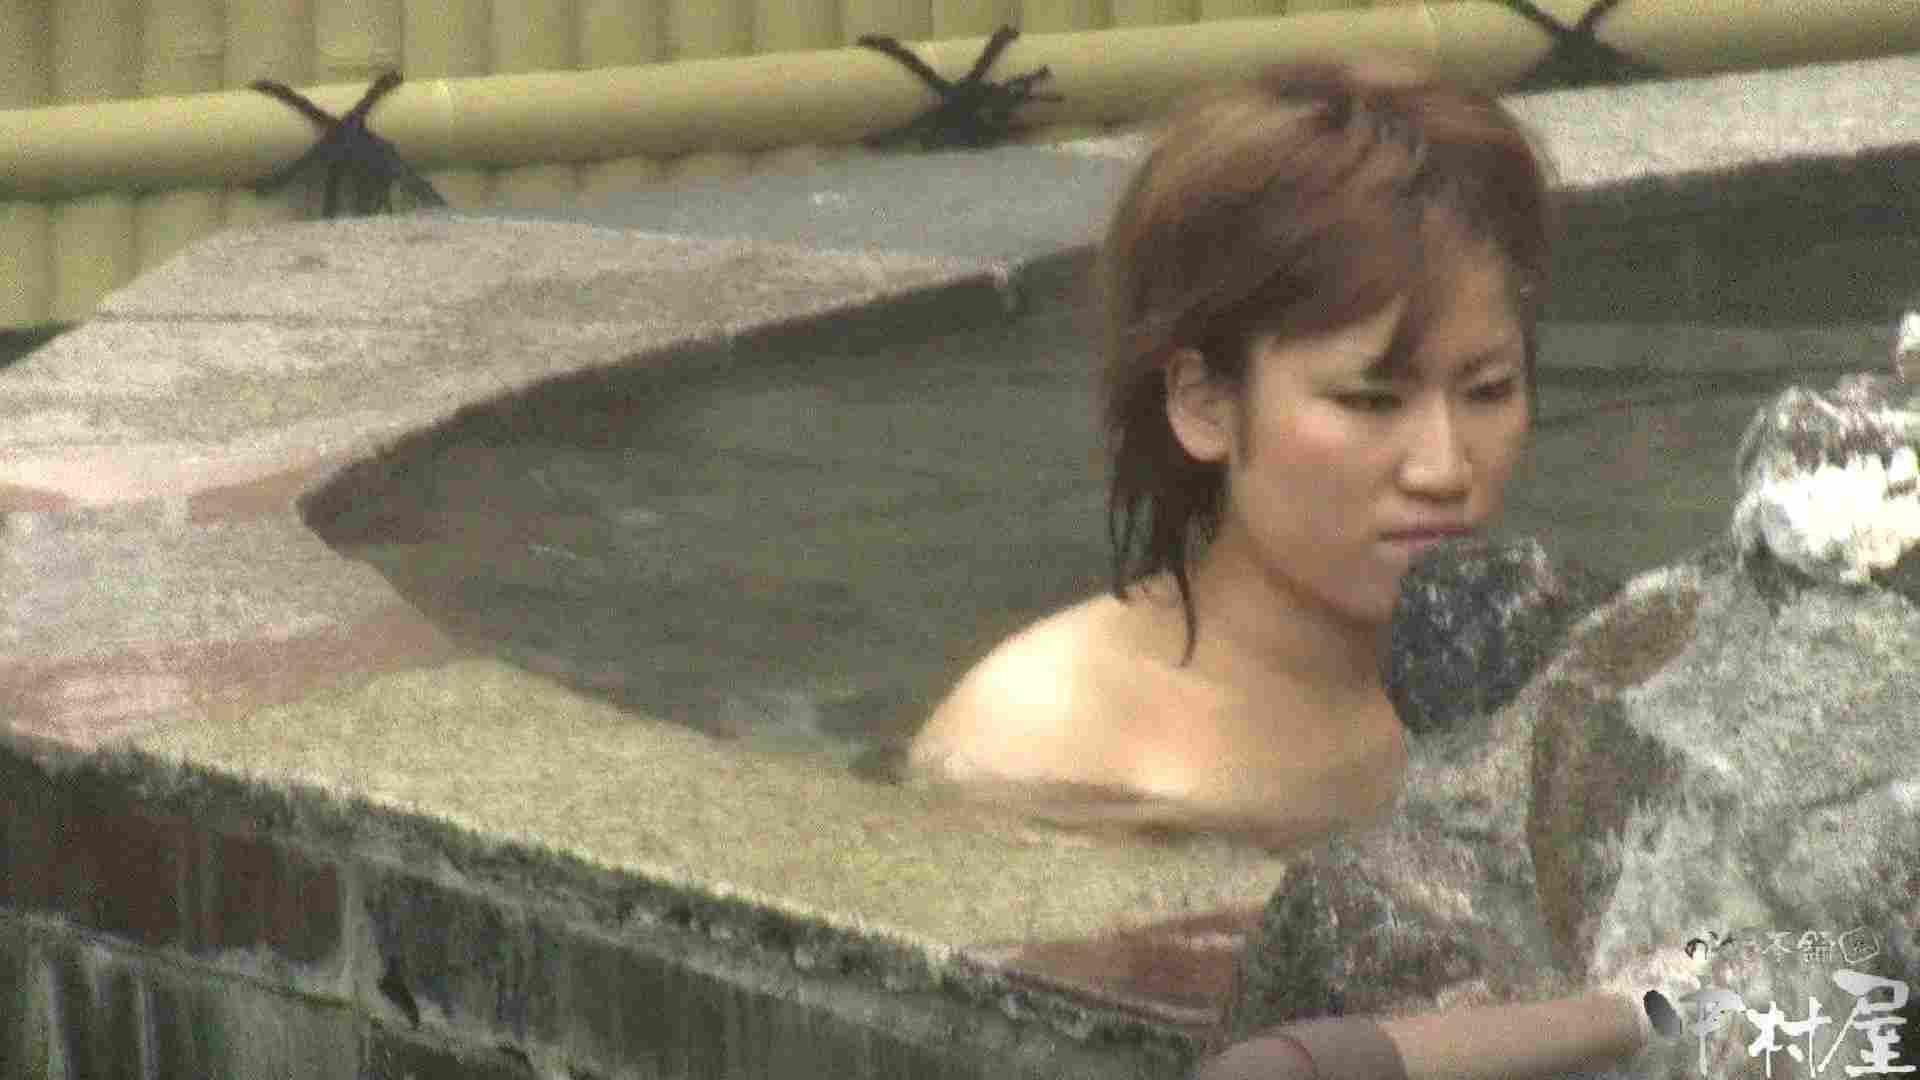 Aquaな露天風呂Vol.918 露天   OLのプライベート  11pic 1